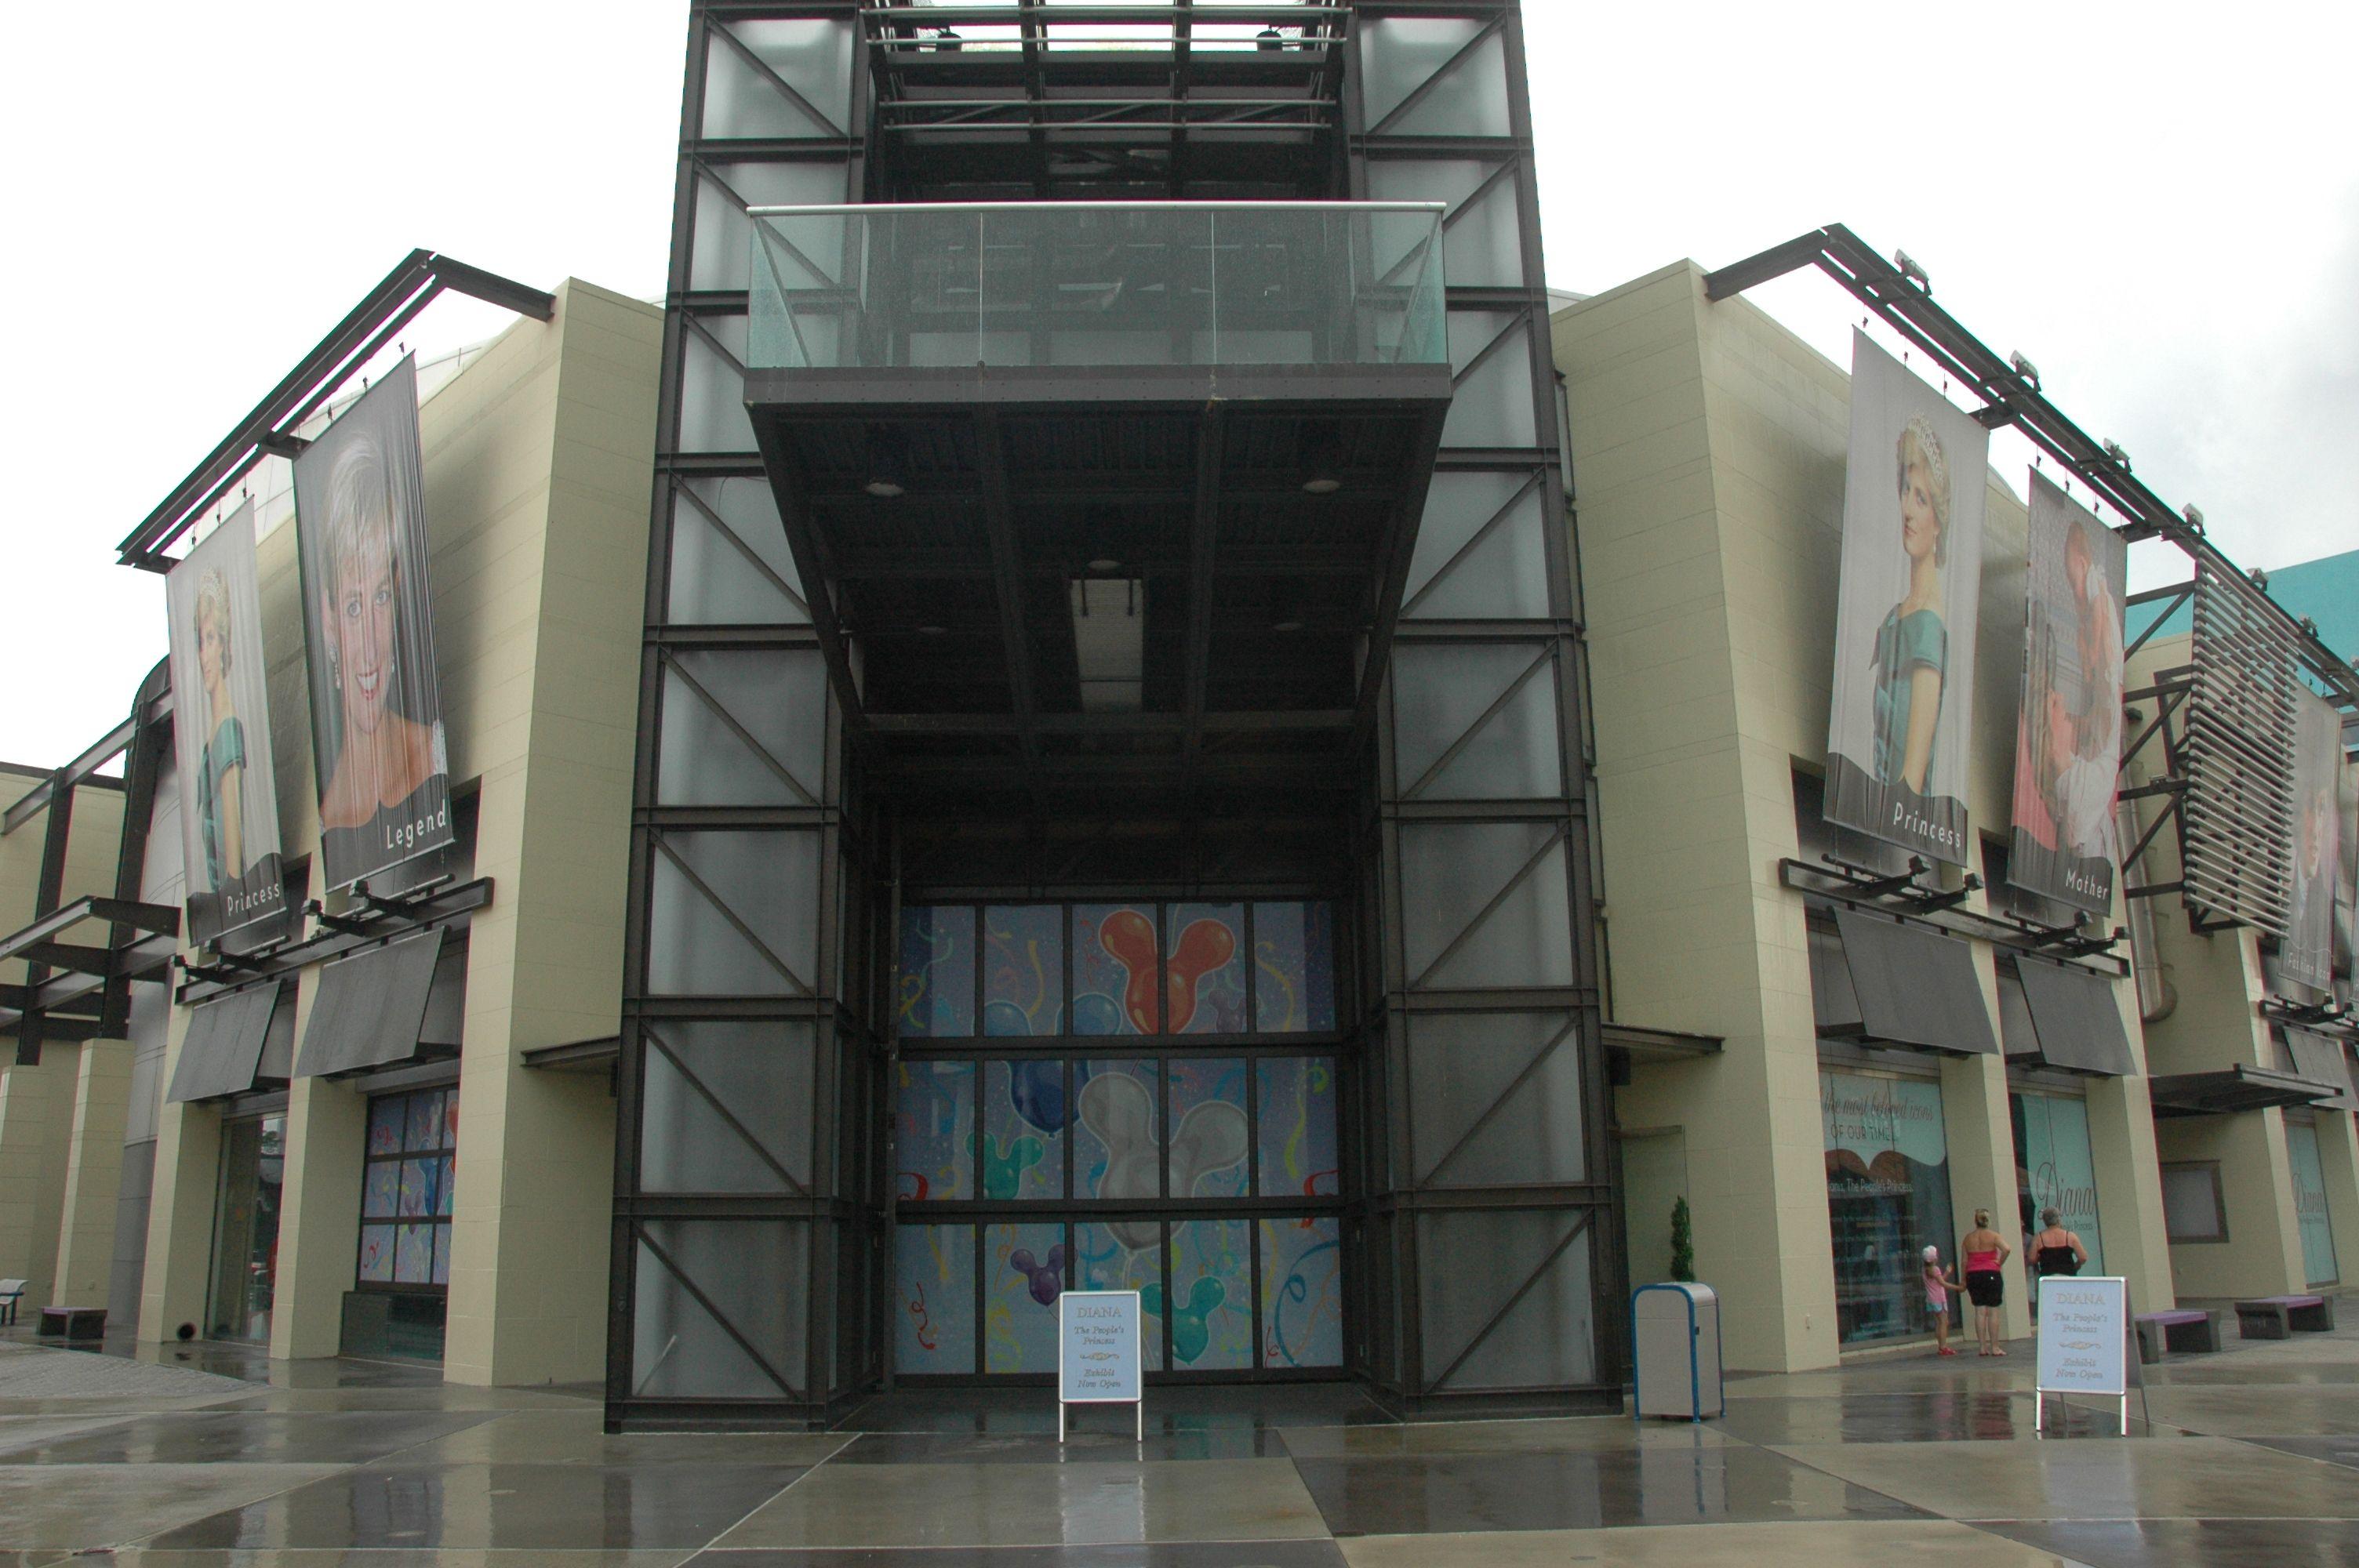 Princess Diana Exhibit opens at Downtown Disney